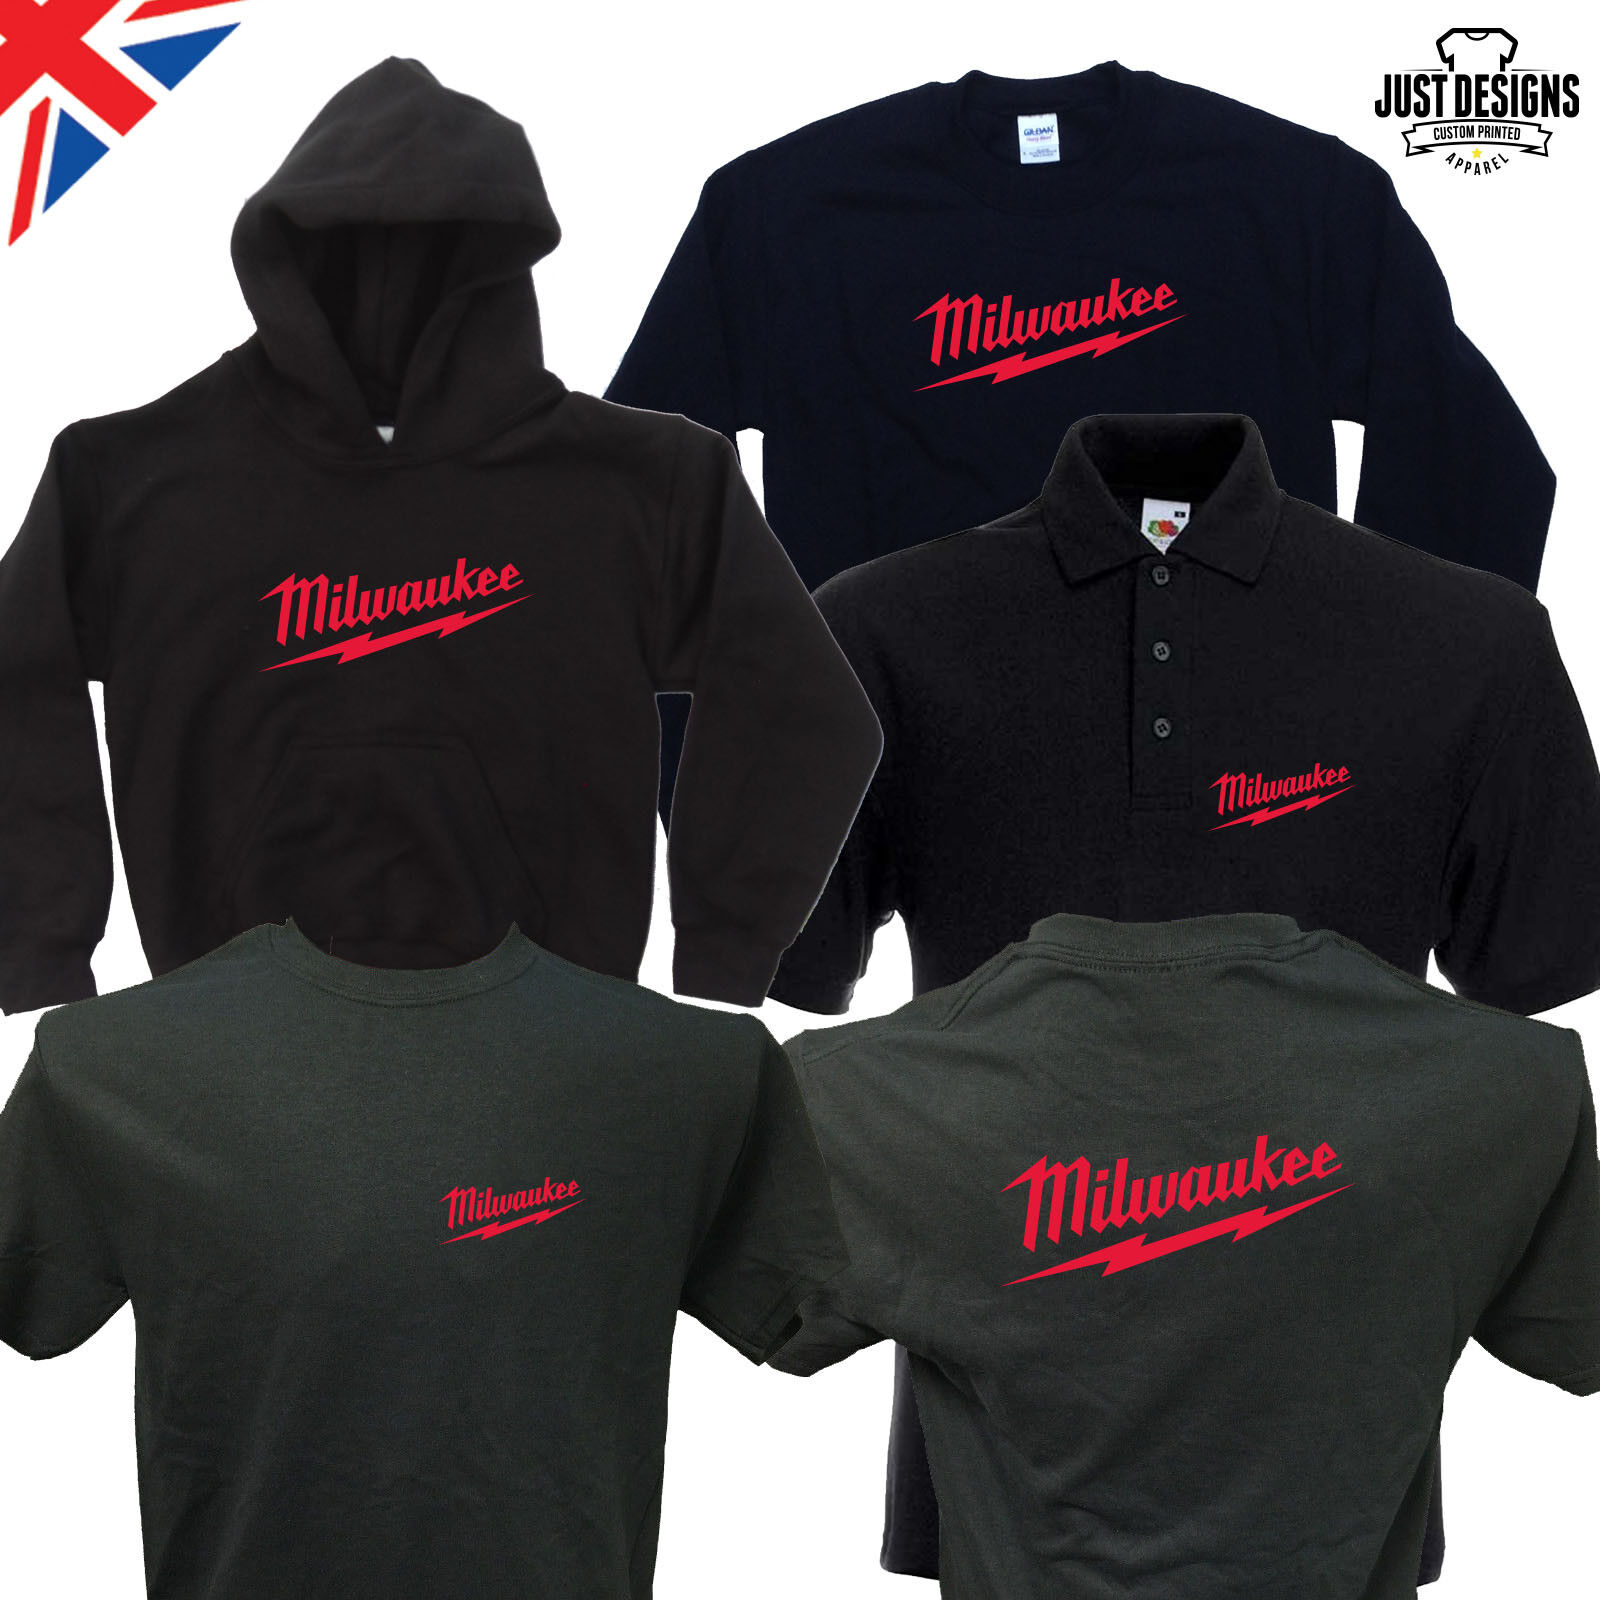 Milwaukee Black T-shirt Zipped Hoodie Polo Shirt Jumper Vest